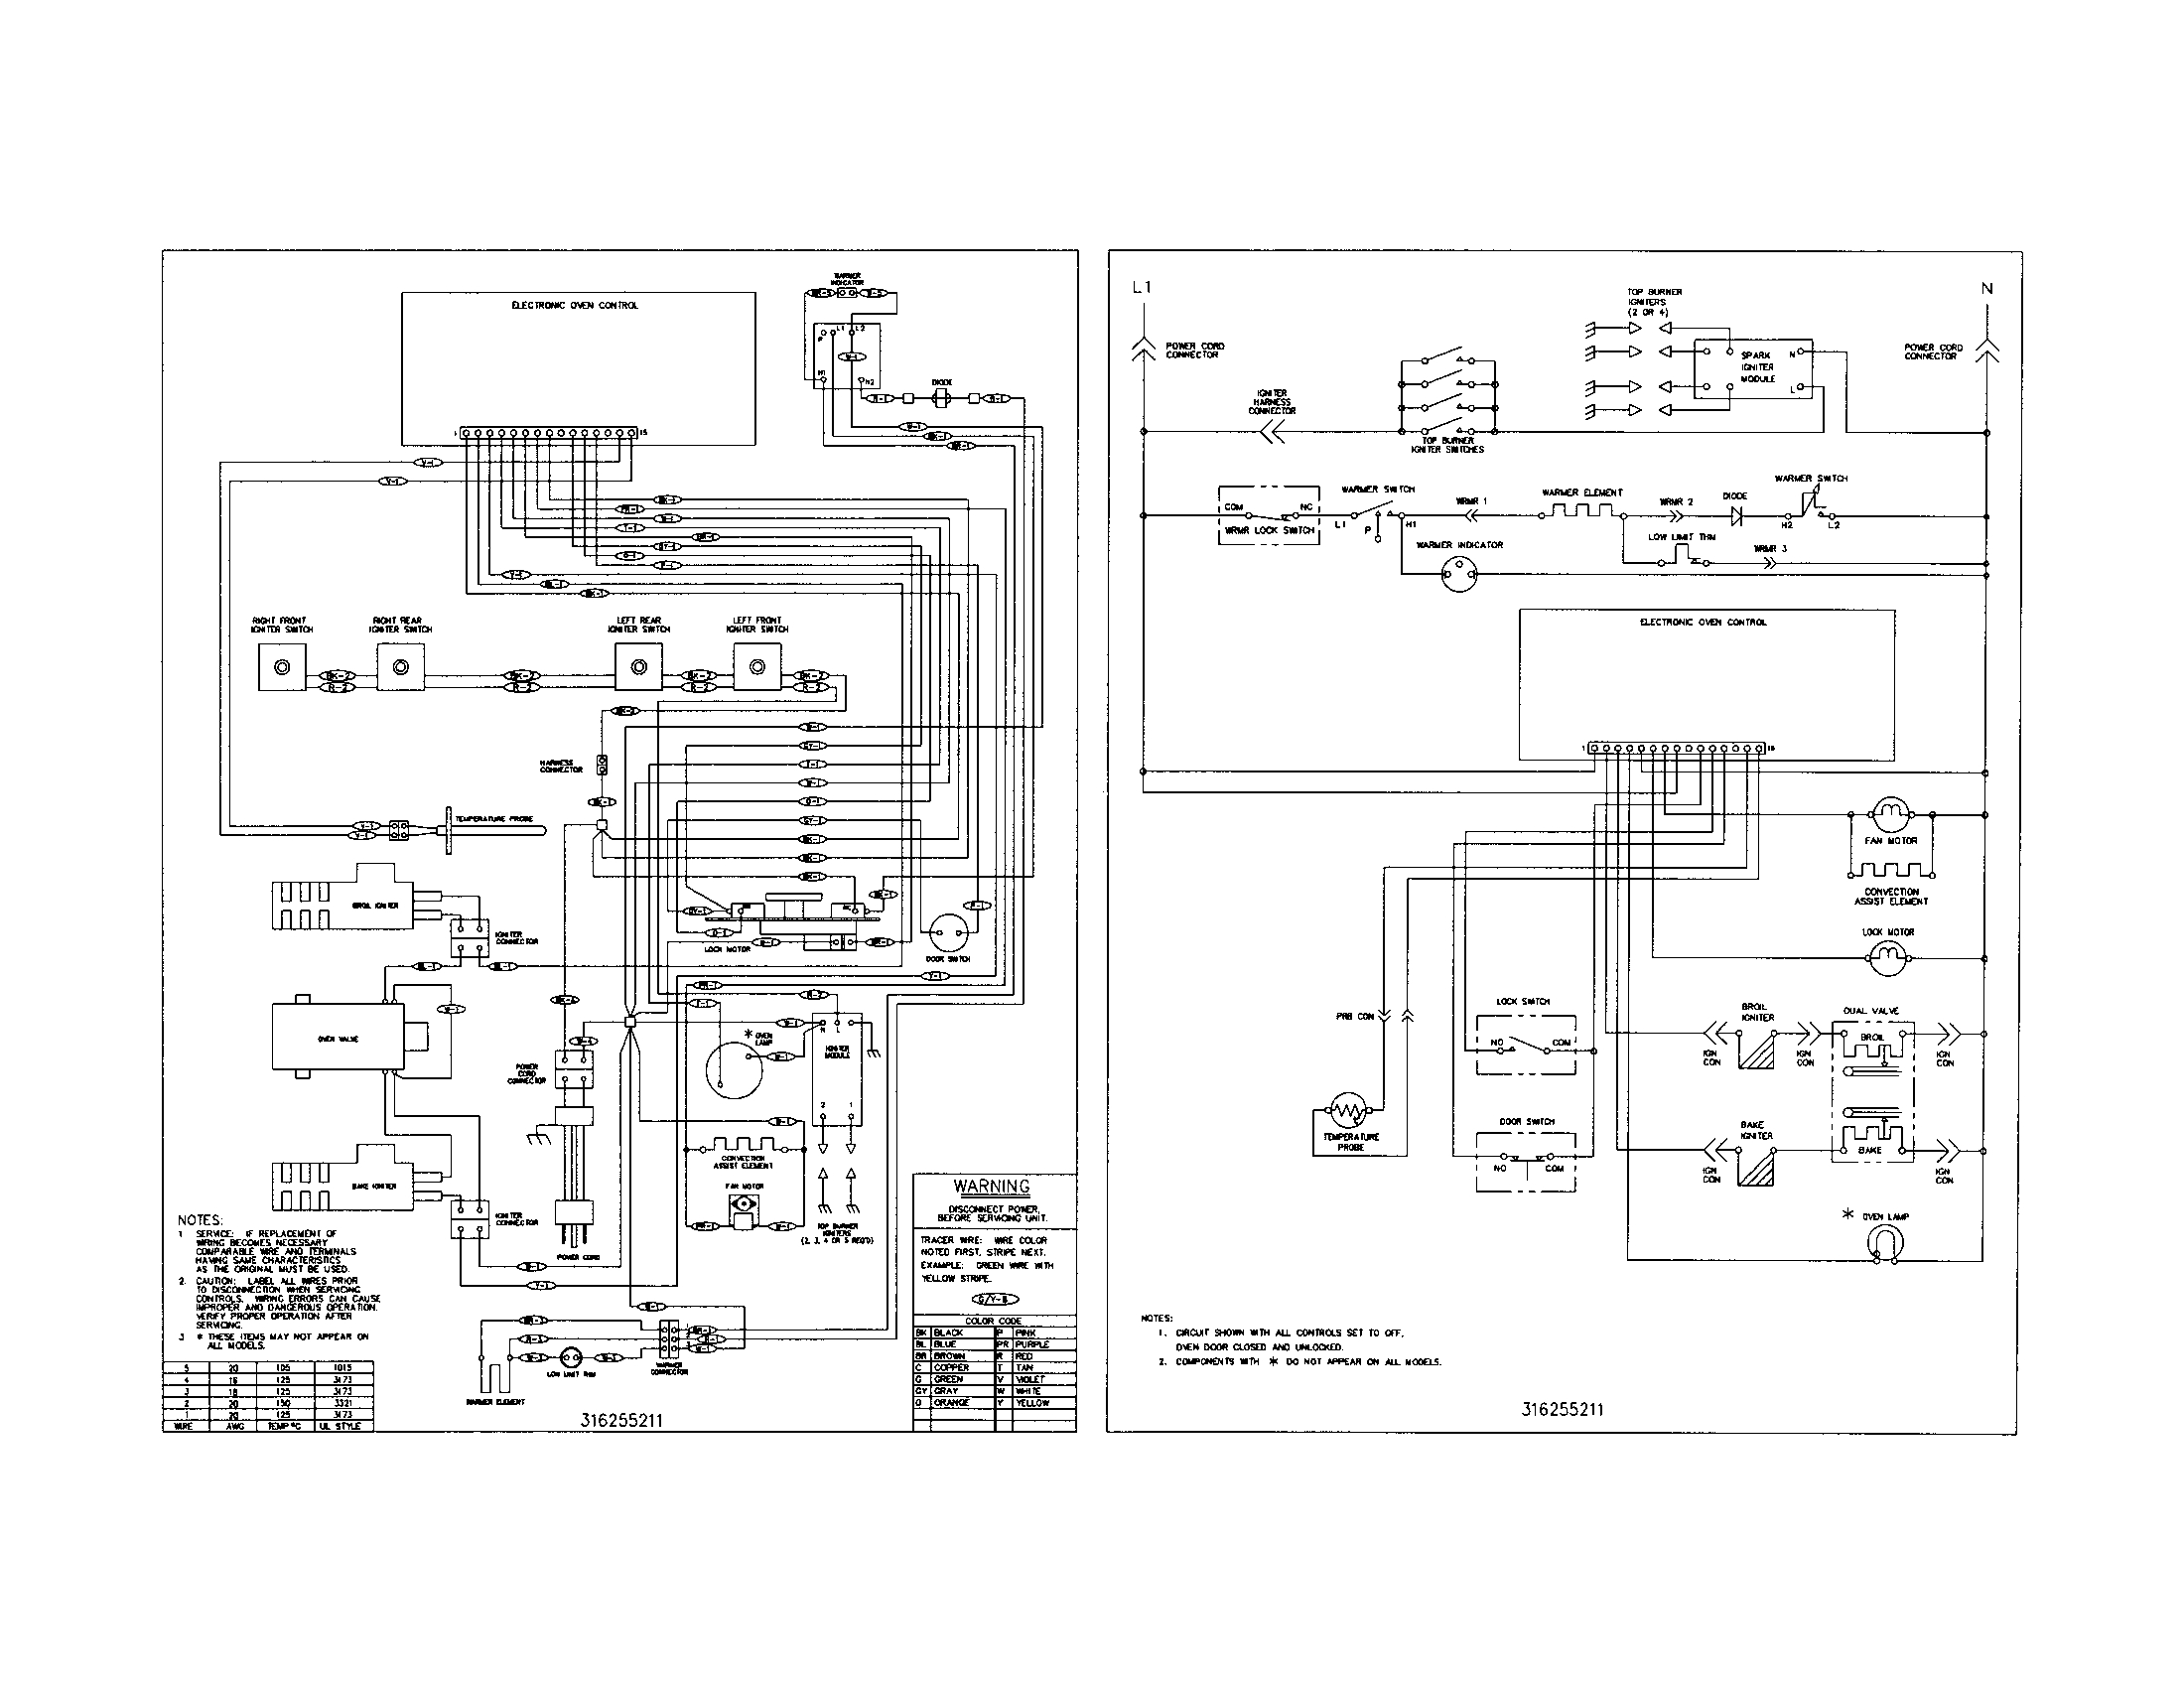 whirlpool gas dryer wiring diagram 95 mustang gt cooling fan free frigidaire luxury amazing sample ideas